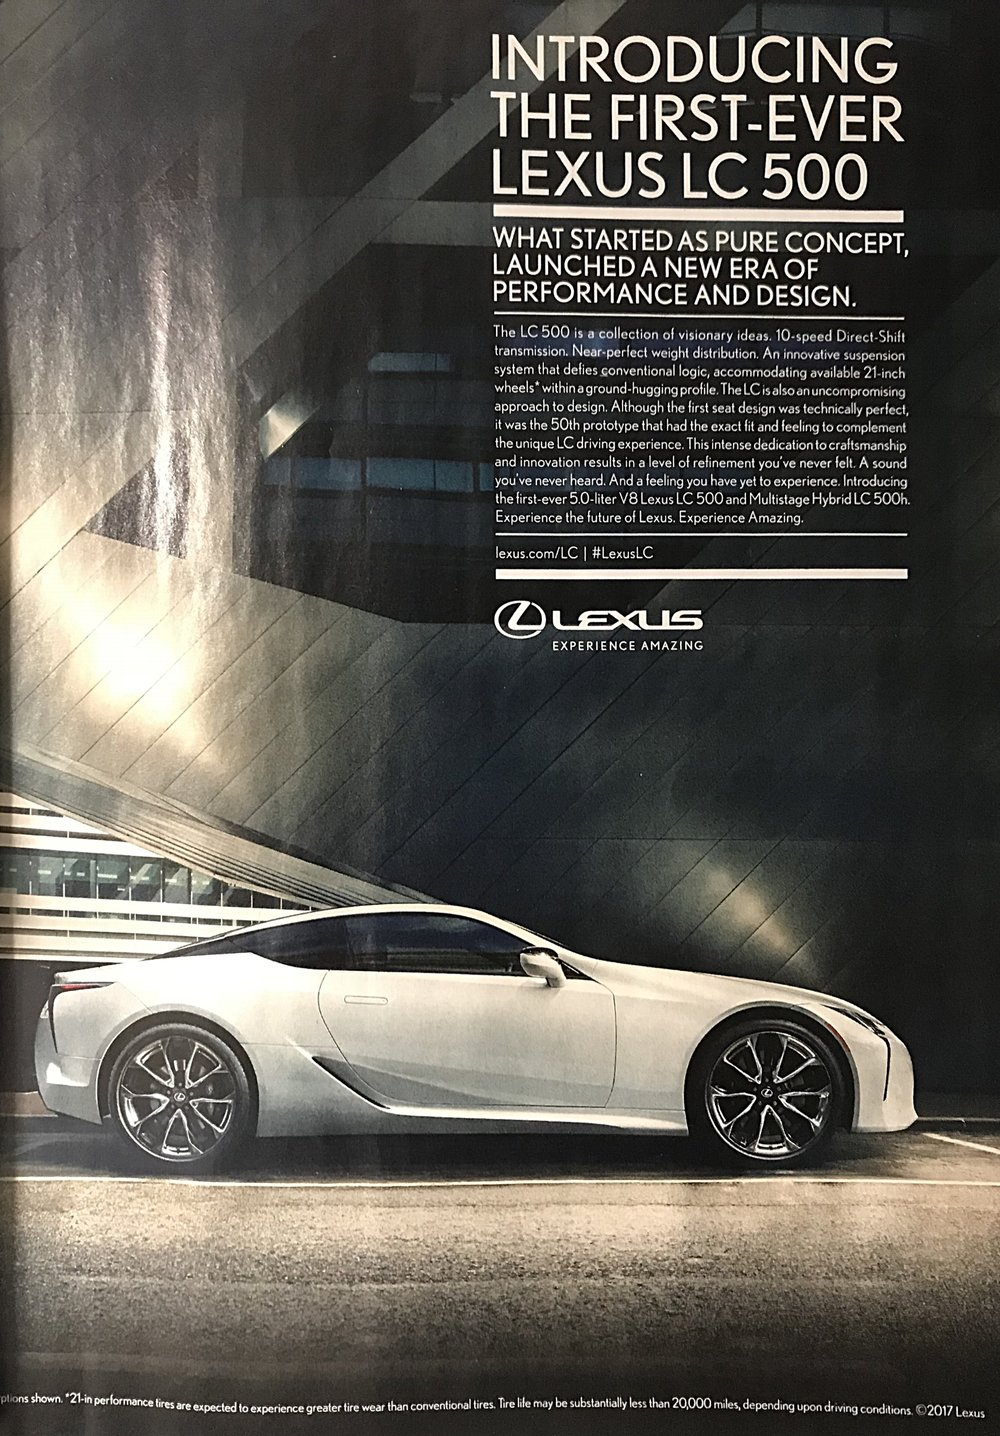 Lexus ad.jpg